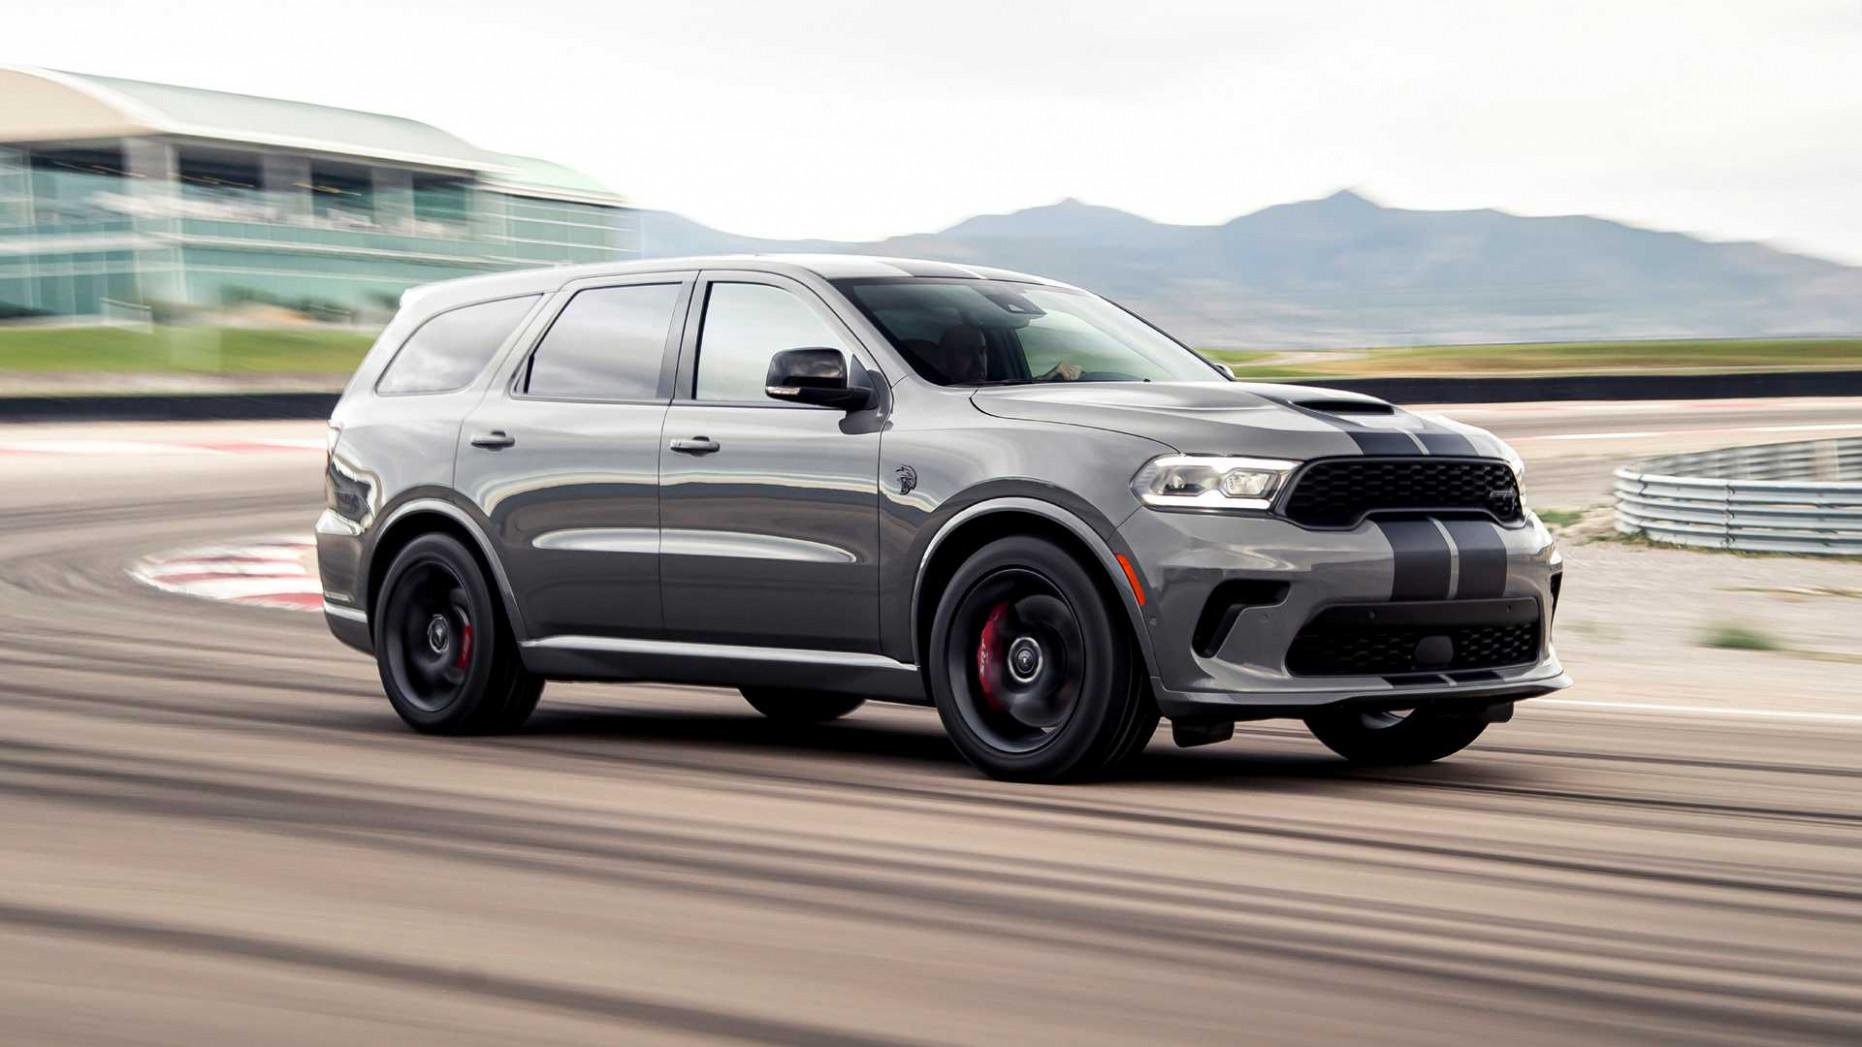 Concept 2022 Dodge Durango Srt